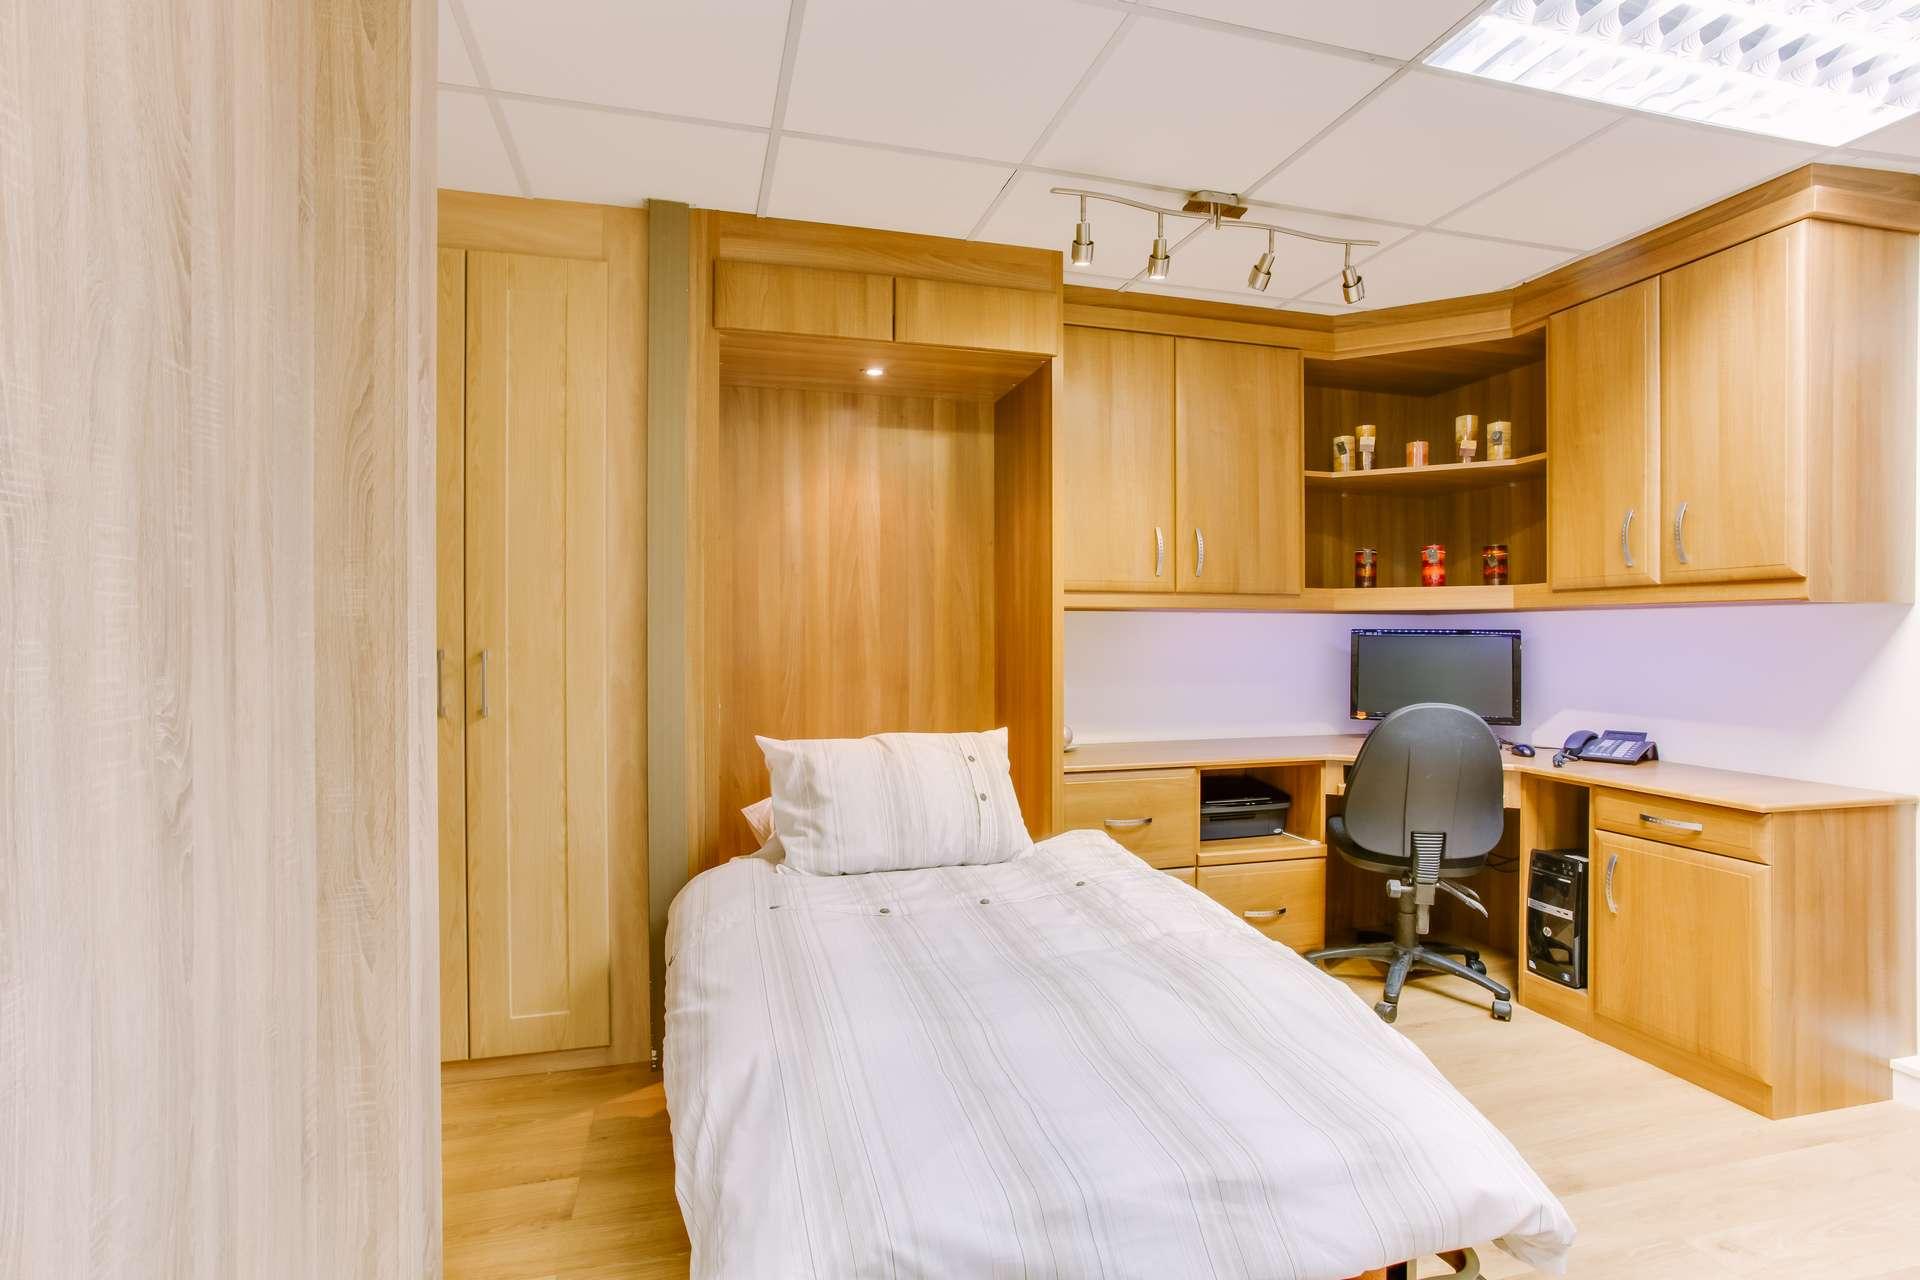 Hideaway beds furniture Dorset